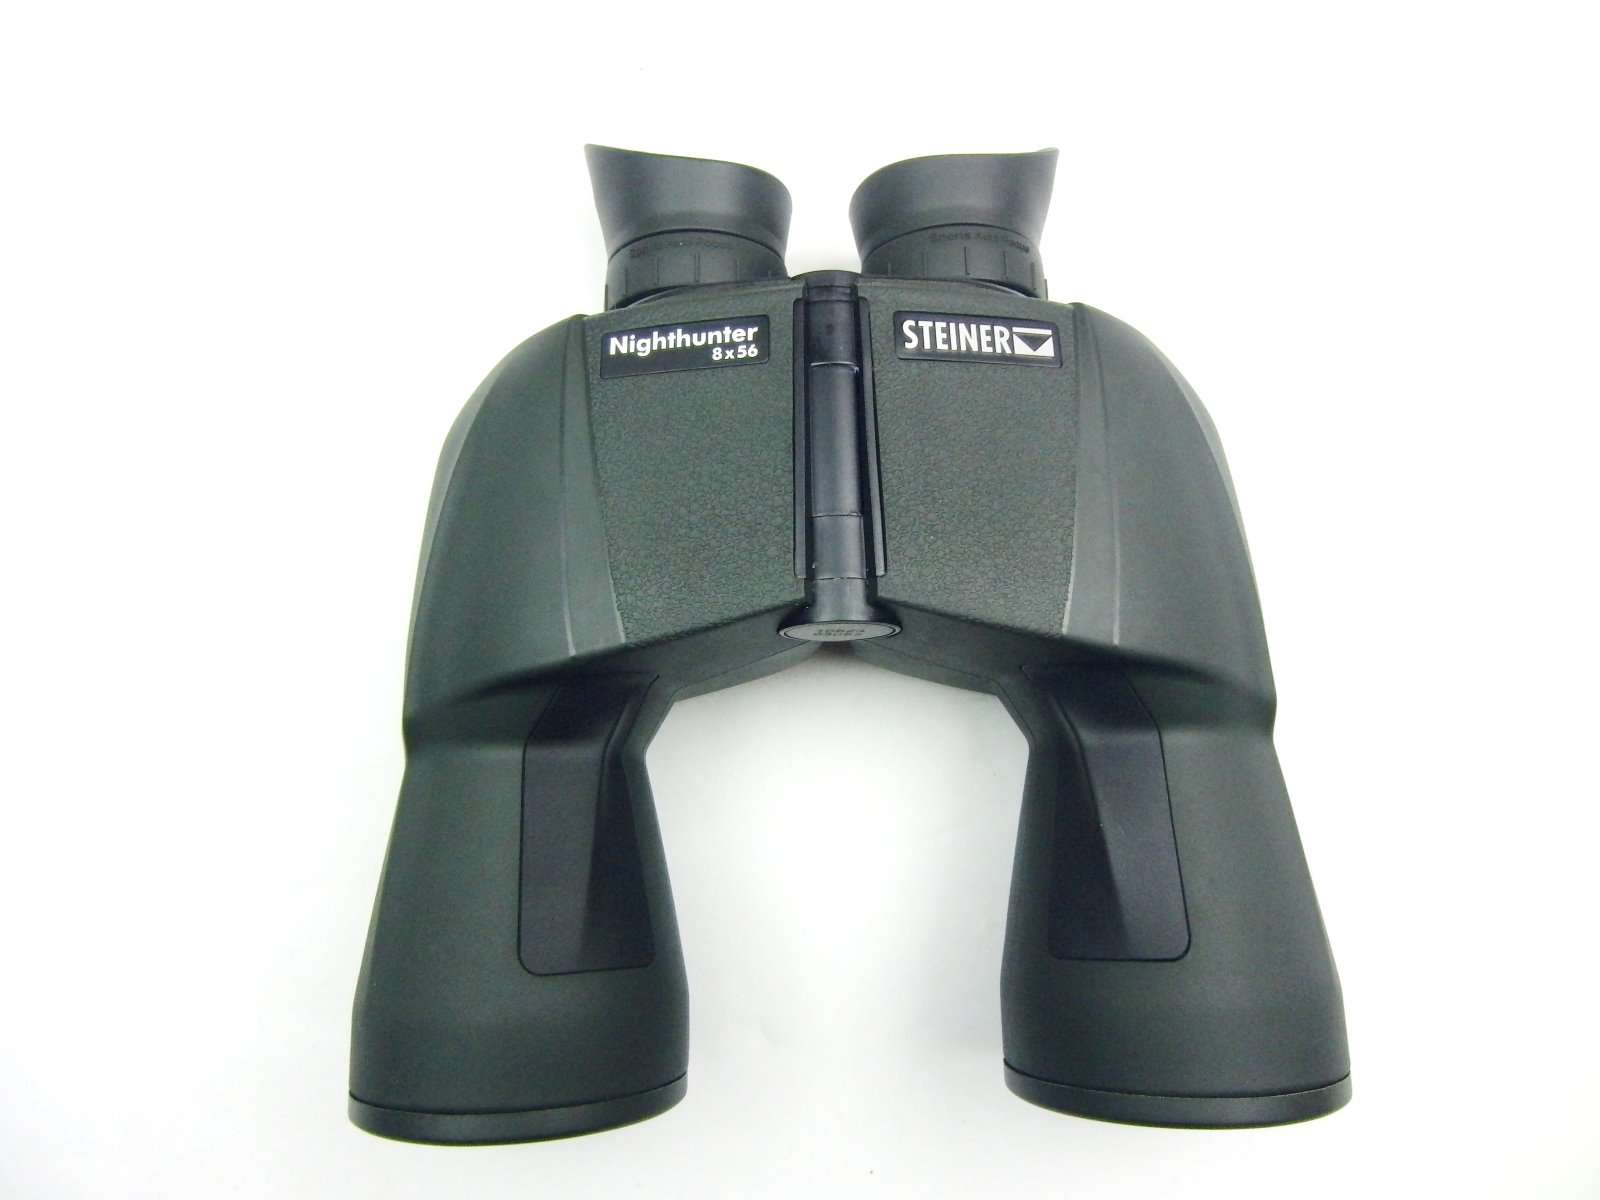 Steiner nighthunter ferngläser optik waffen schmitt